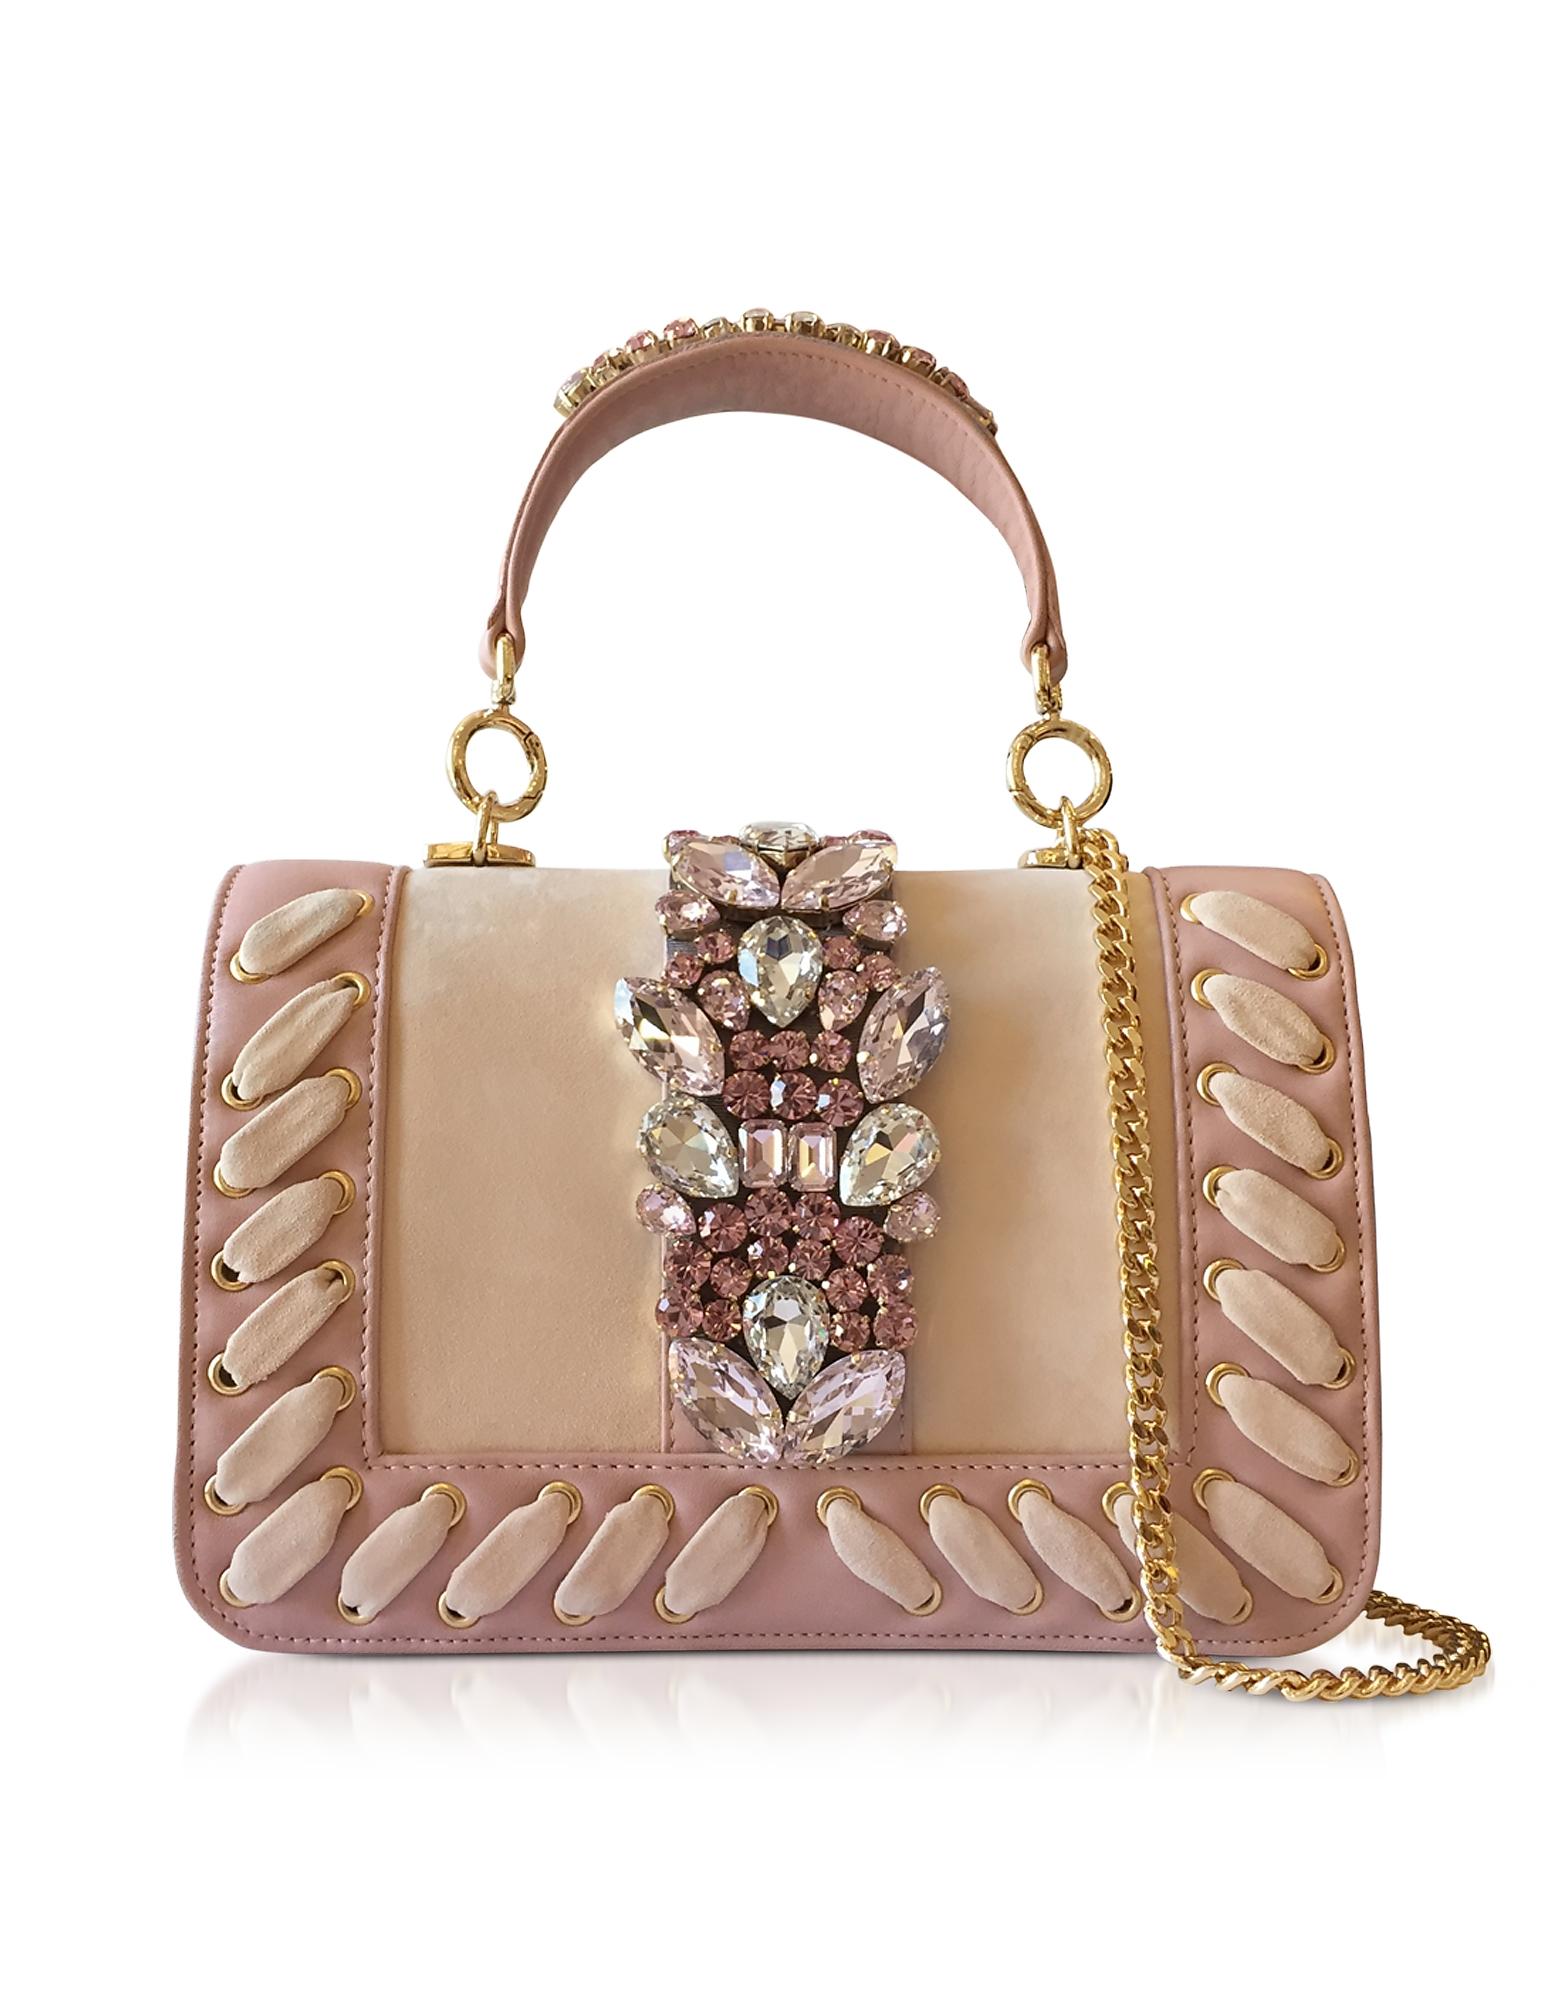 Gedebe Handbags, Bibi Crocus Suede Plot Satchel Bag w/Crystals